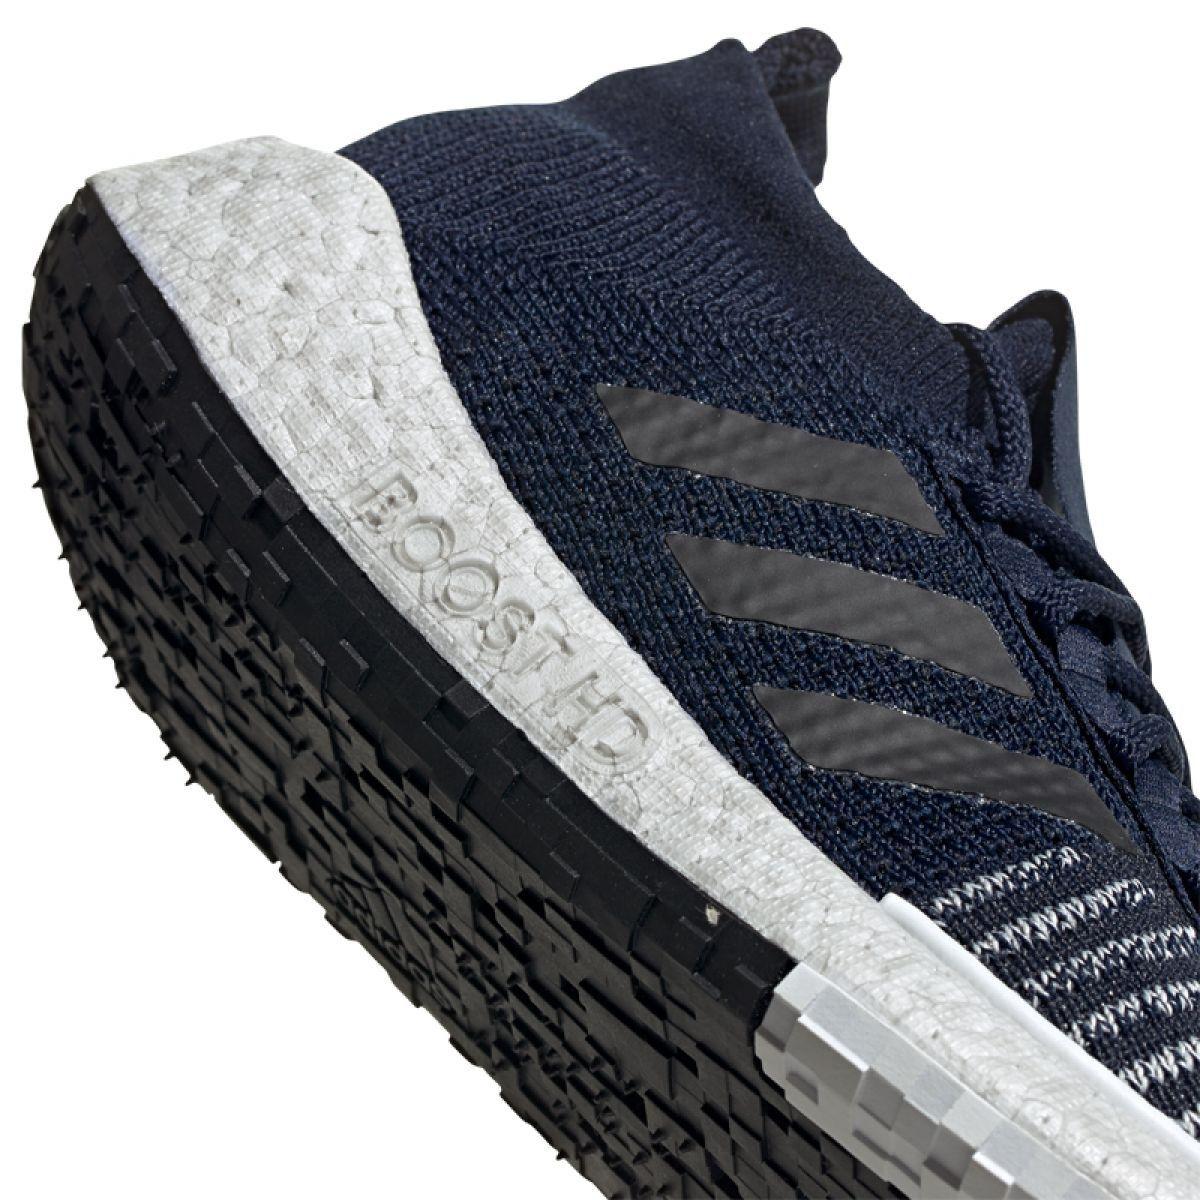 Buty Adidas Pulseboost Hd M Ef1357 Granatowe Adidas Superstar Sneaker Adidas Sneakers Sneakers